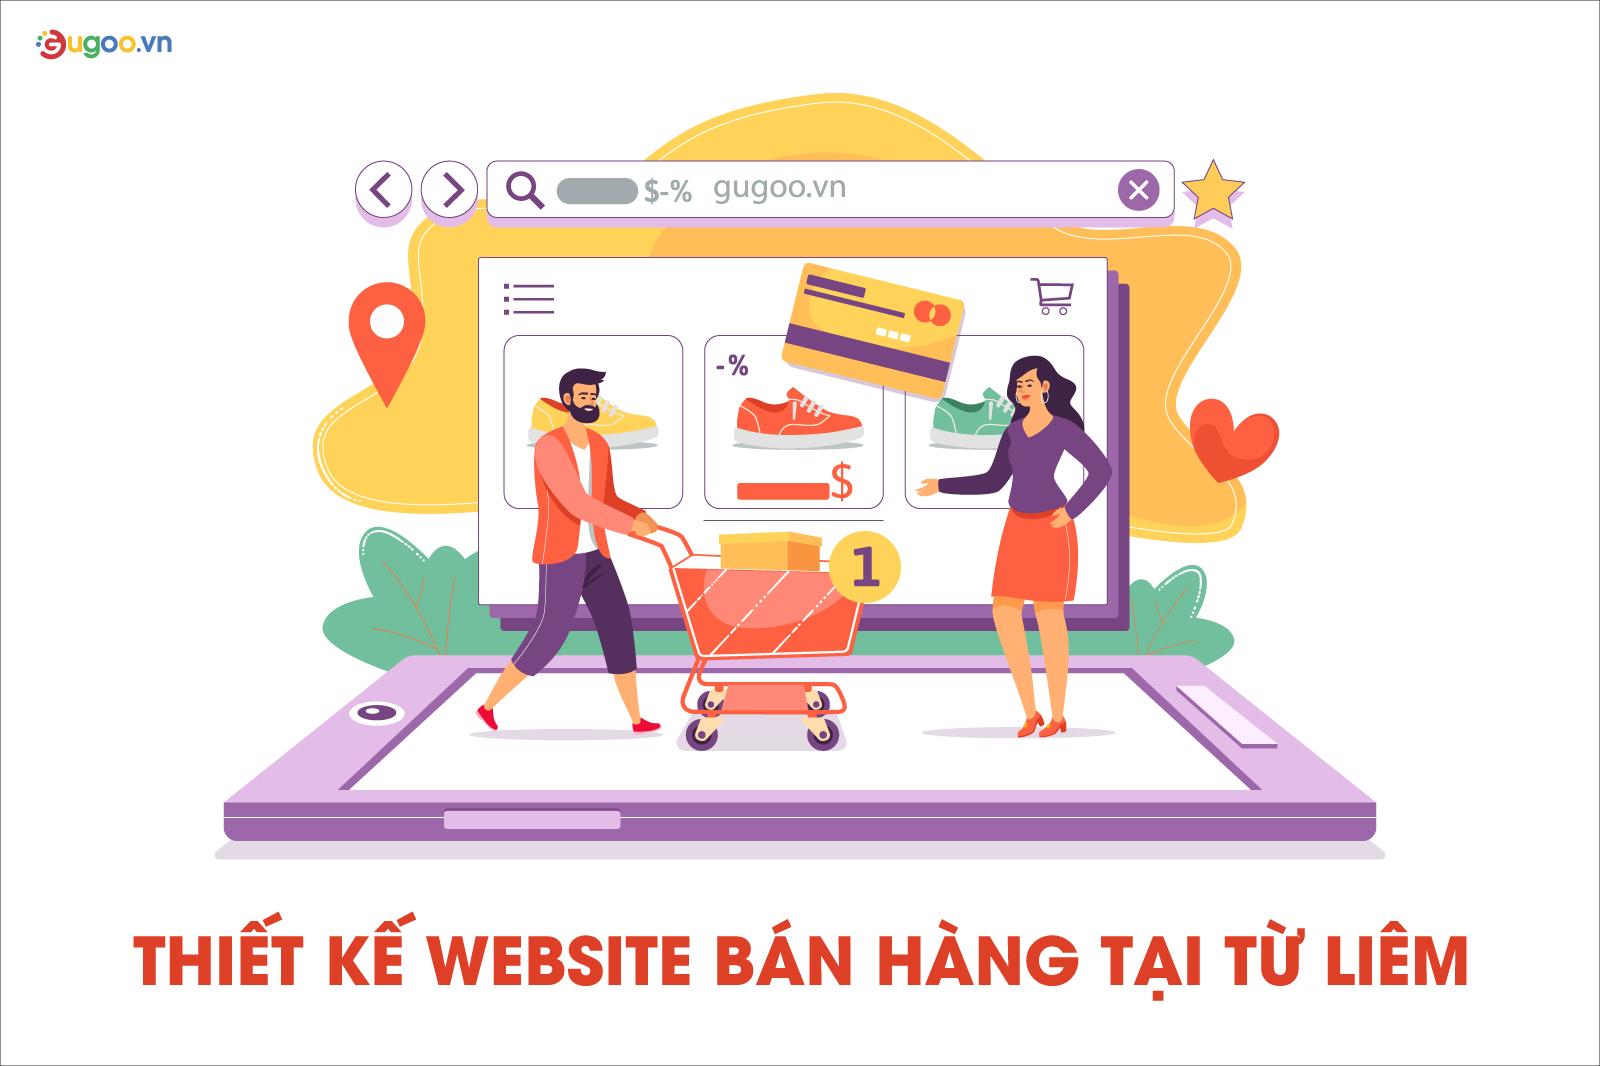 website ban hang tai tu liem